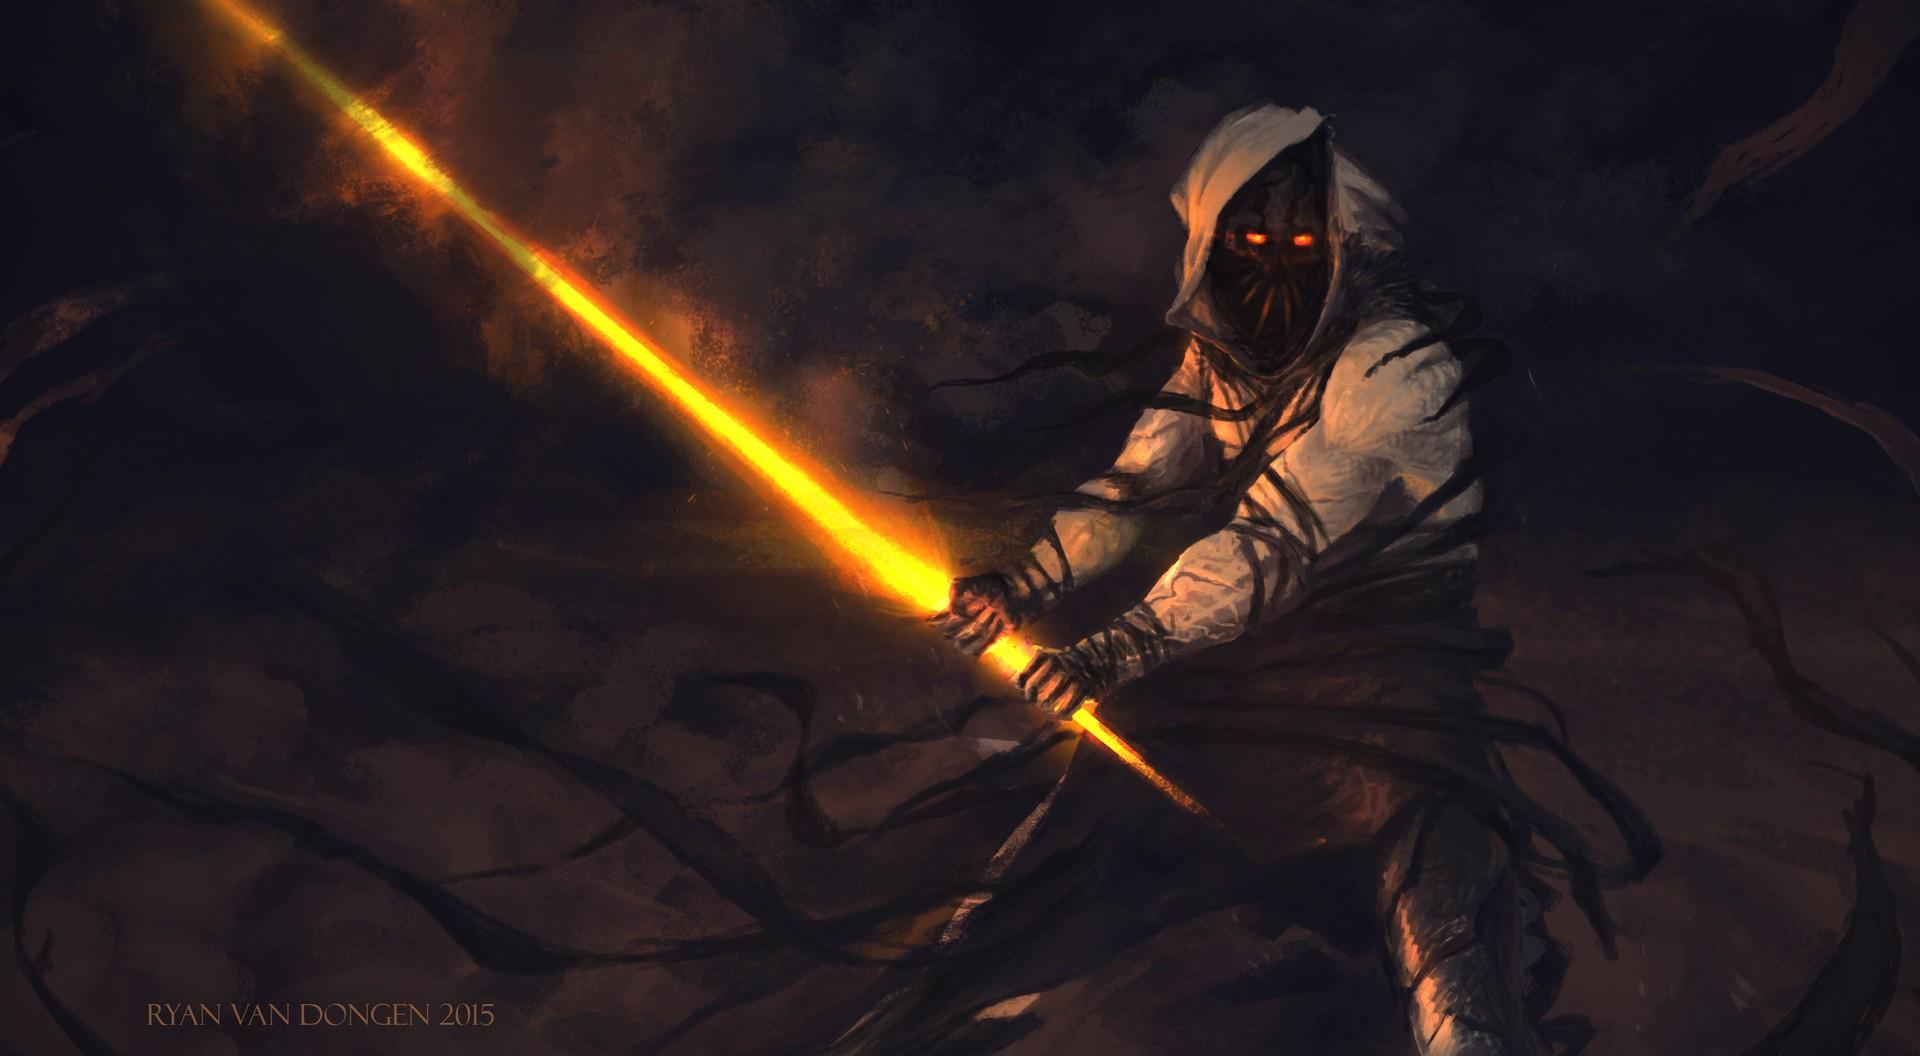 General 1920x1056 creature digital art sword orange eyes hoods yellow eyes Ryan van Dongen 2015 (Year) fantasy art dark fantasy glowing eyes demon warrior